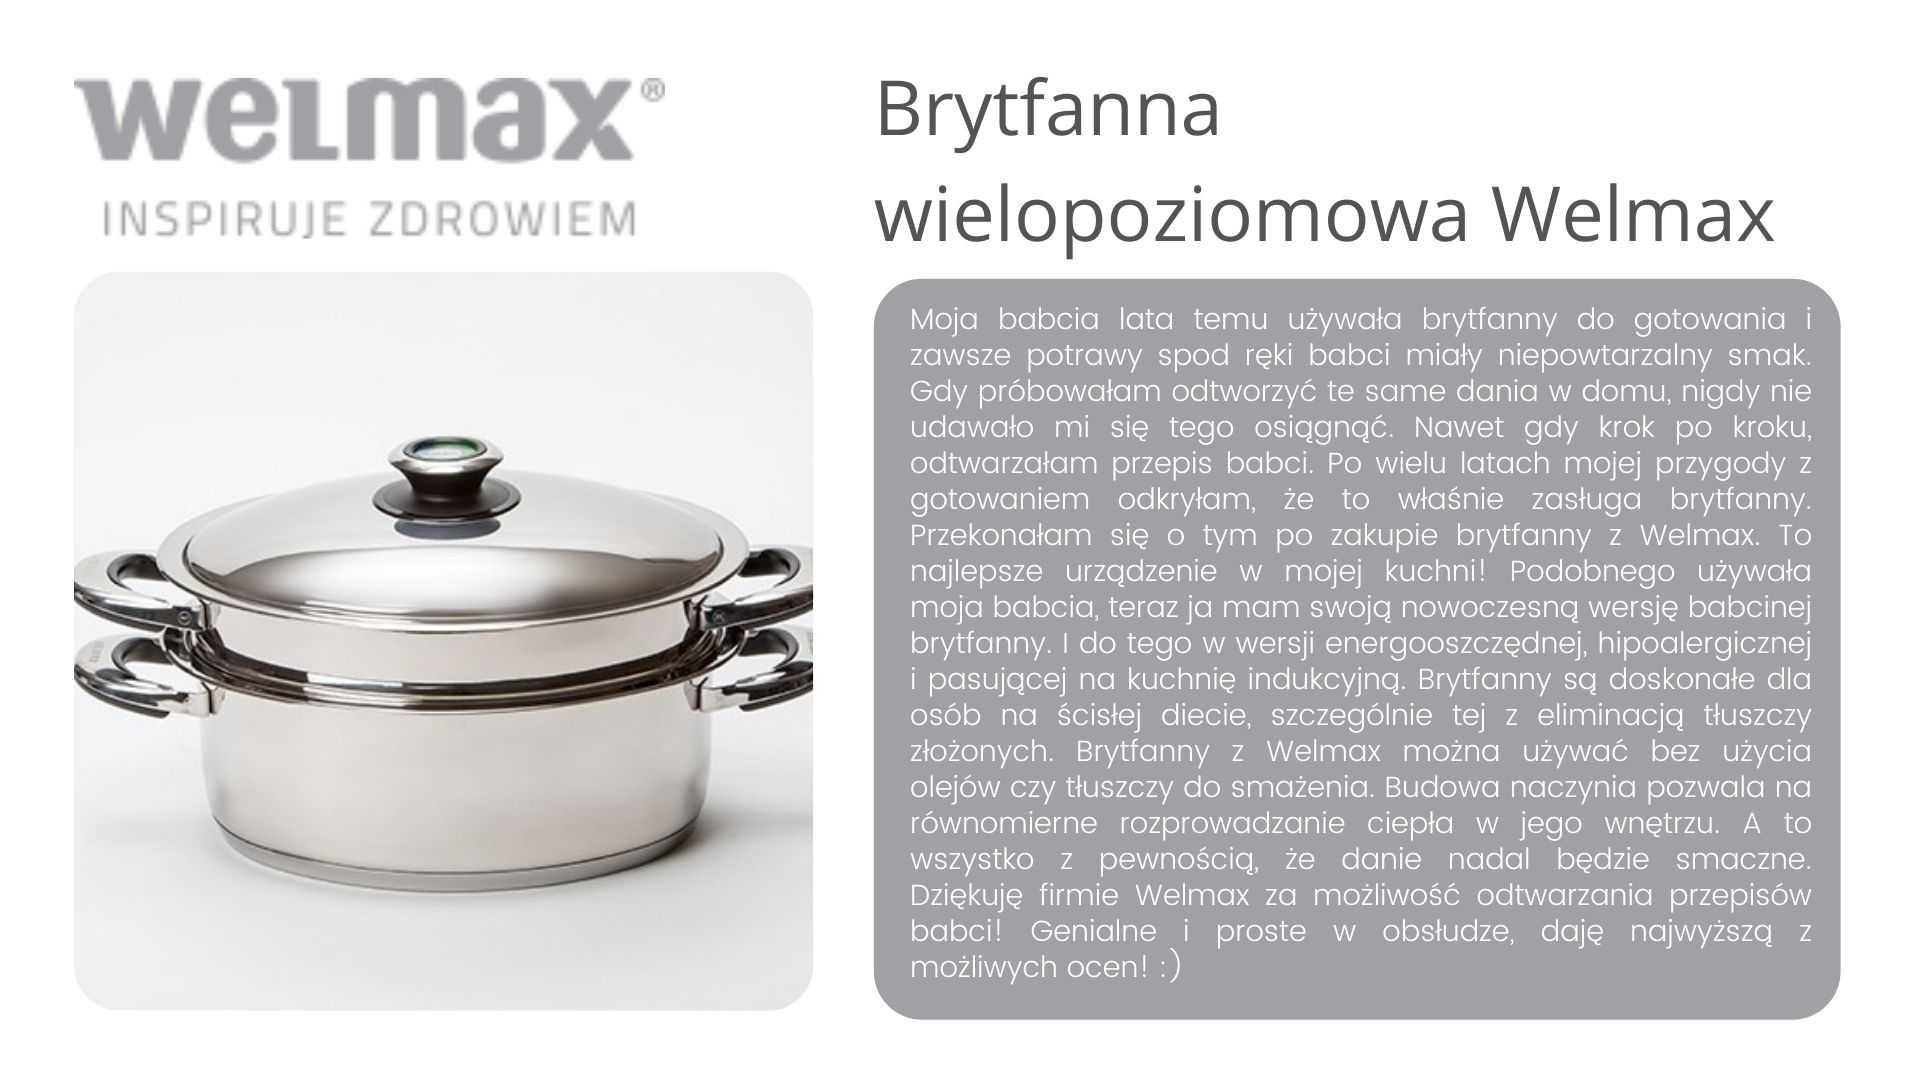 Brytfana Welmax opinie